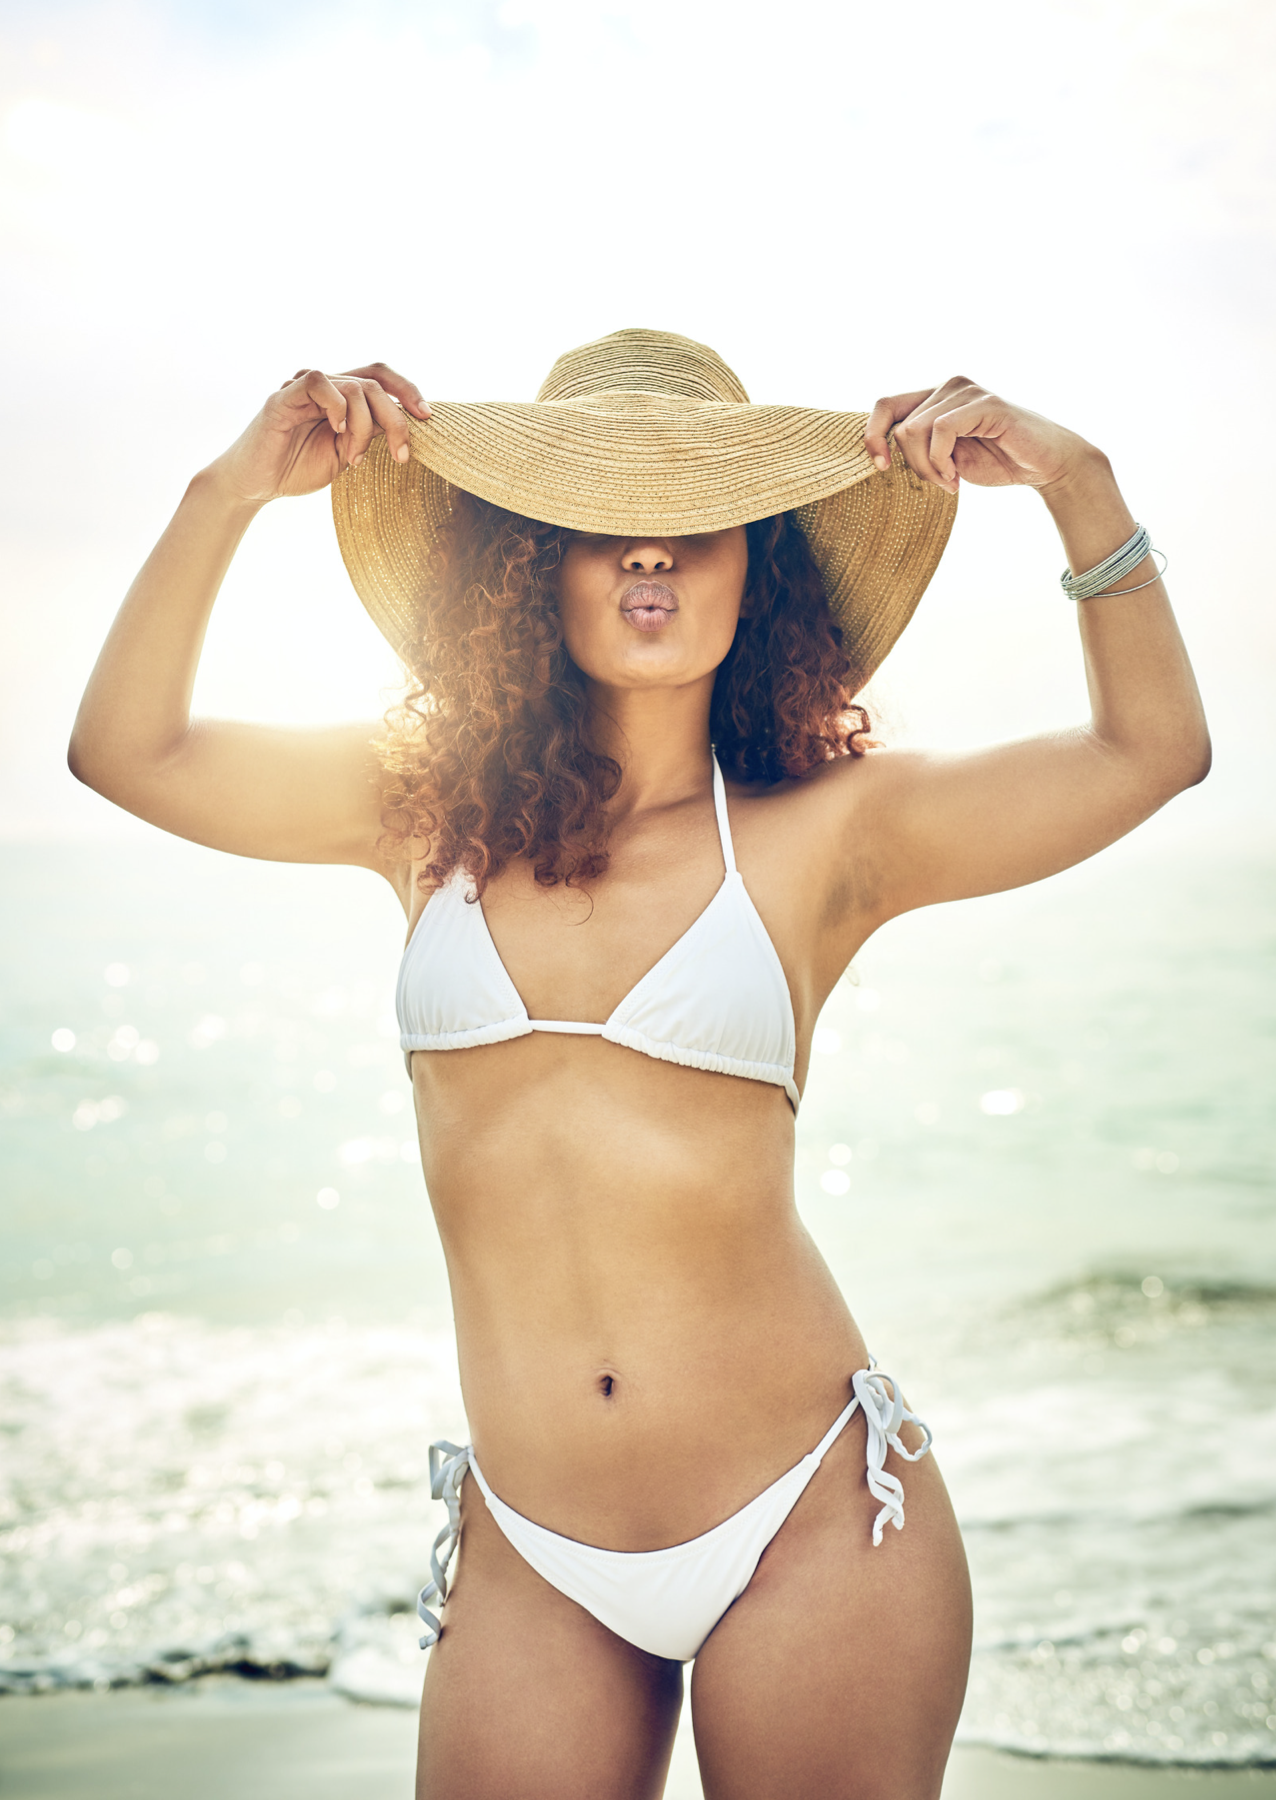 Girl in a bikini wearing a hat on the beach